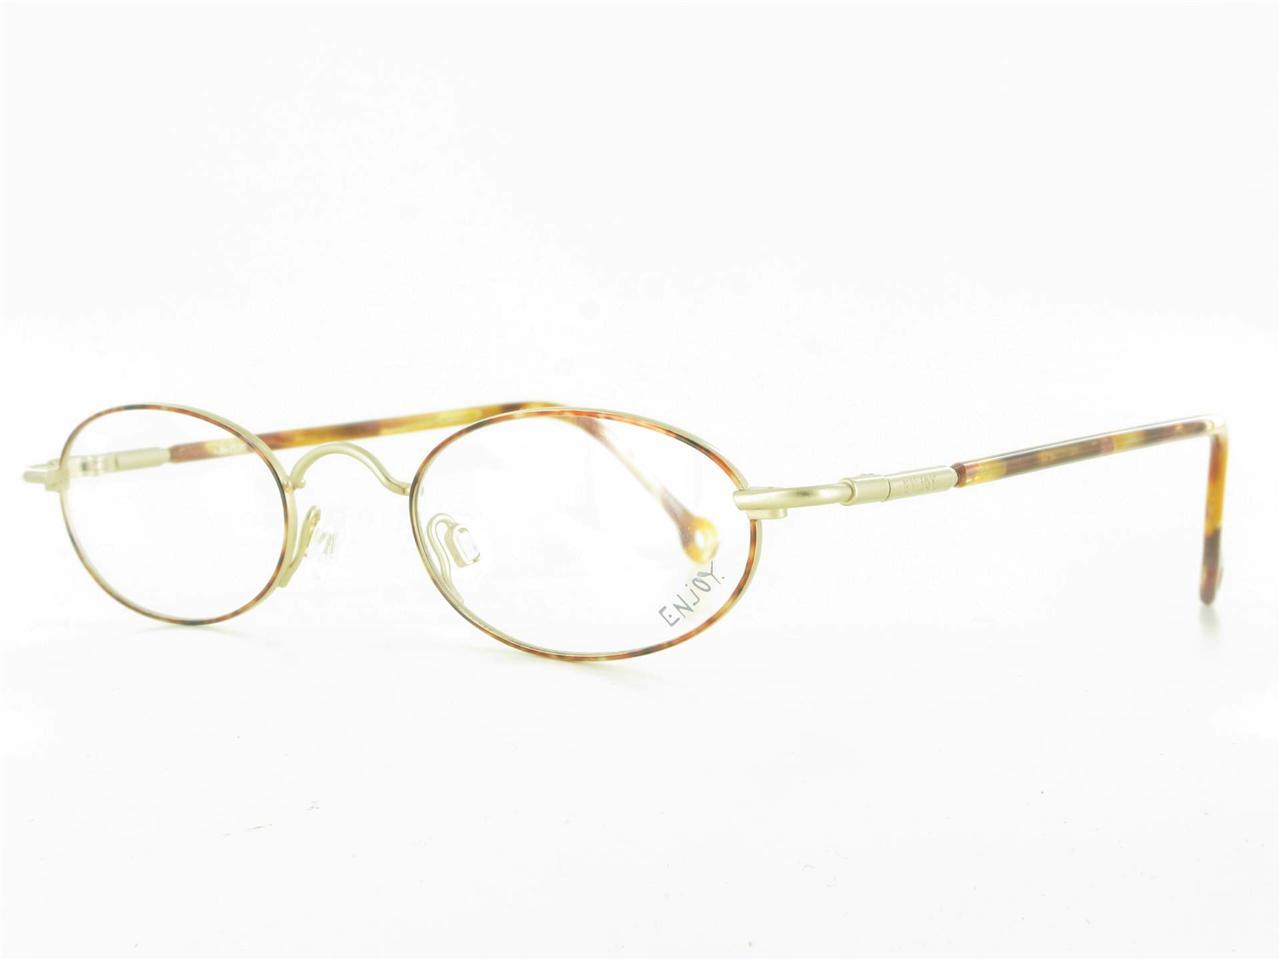 Rodenstock Vintage Eyeglass Frames Gold Havana Tortoise ...